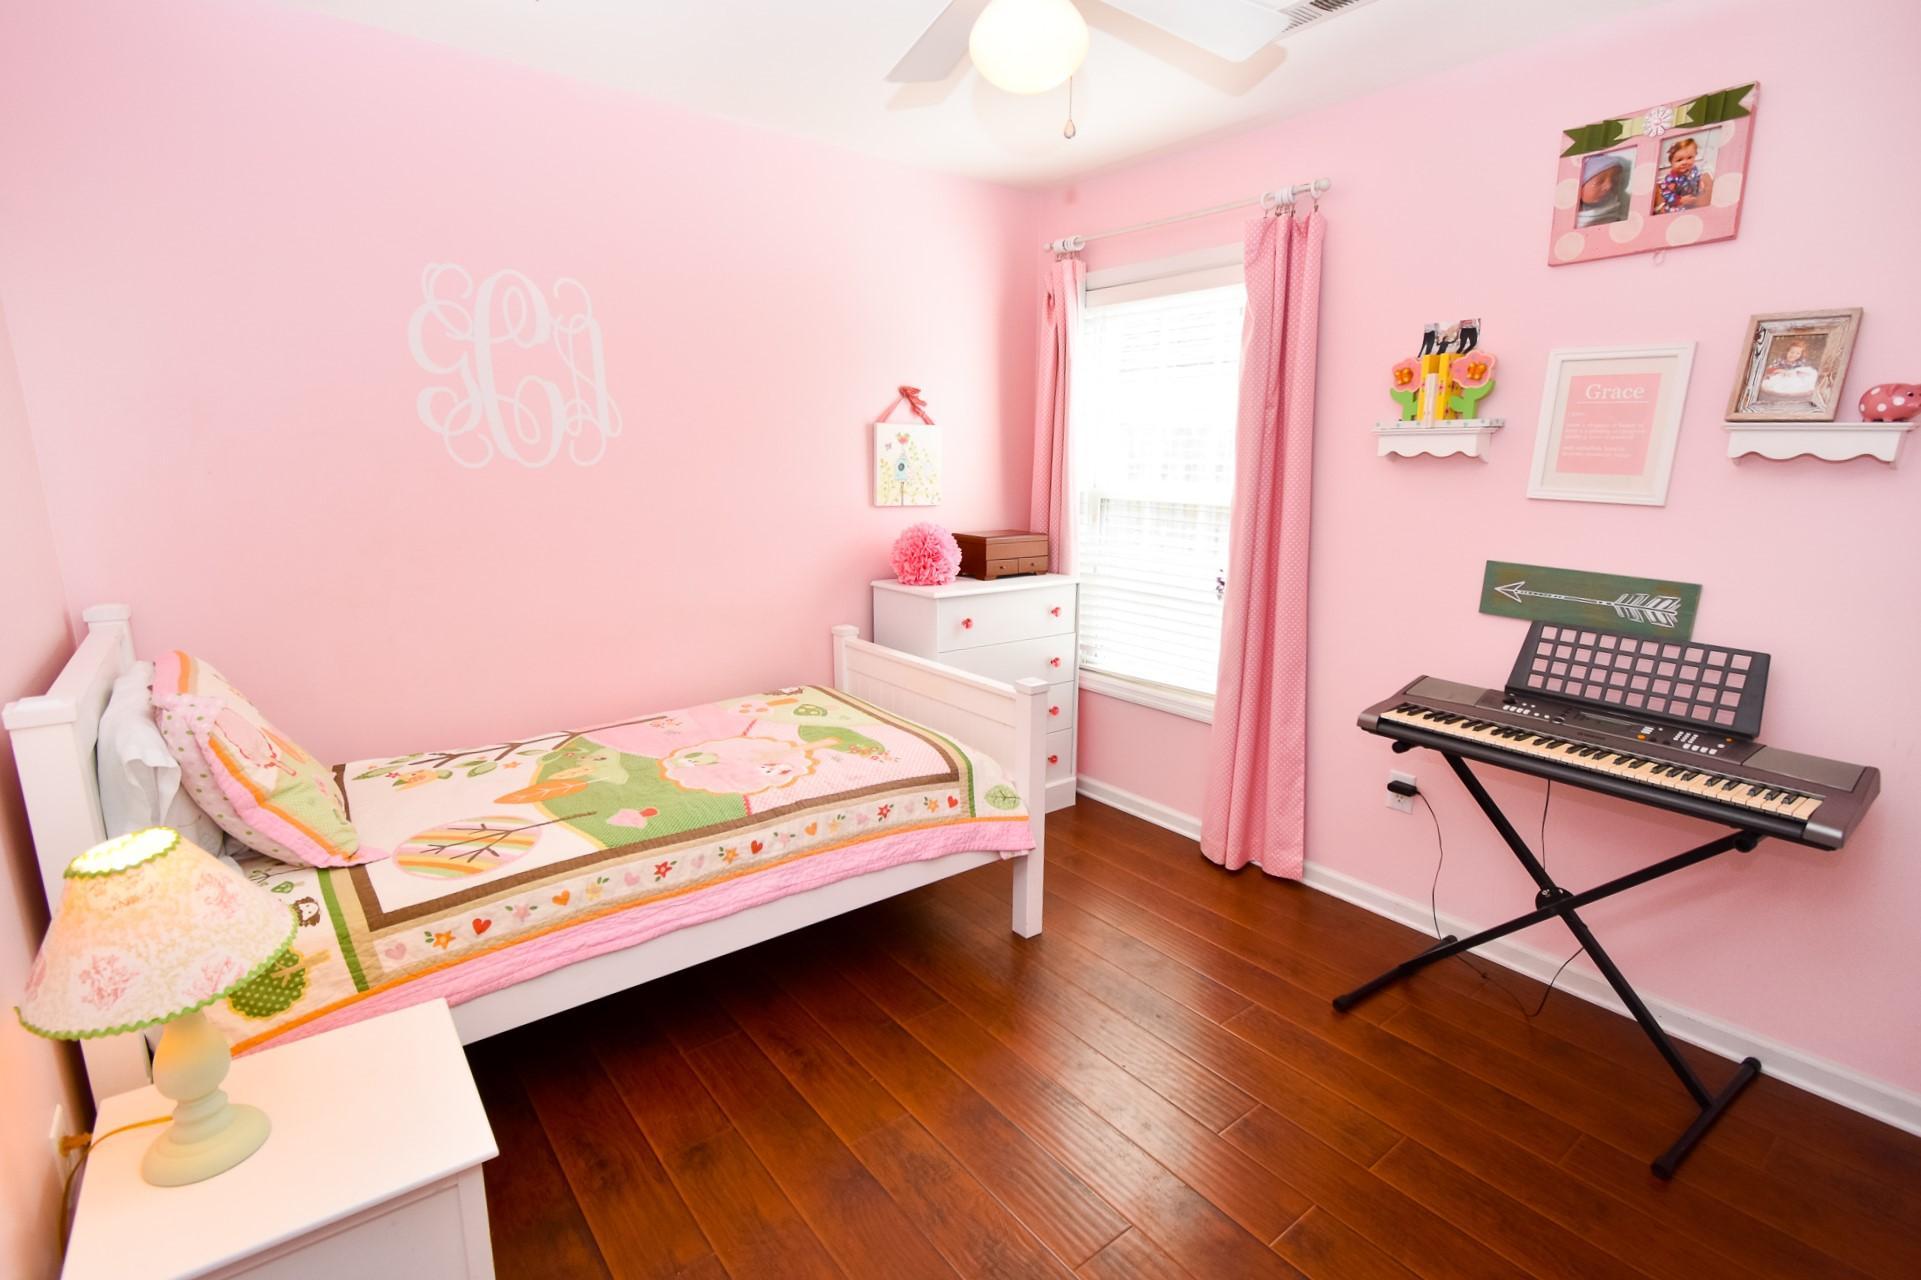 Park West Homes For Sale - 1444 Wellesley, Mount Pleasant, SC - 1